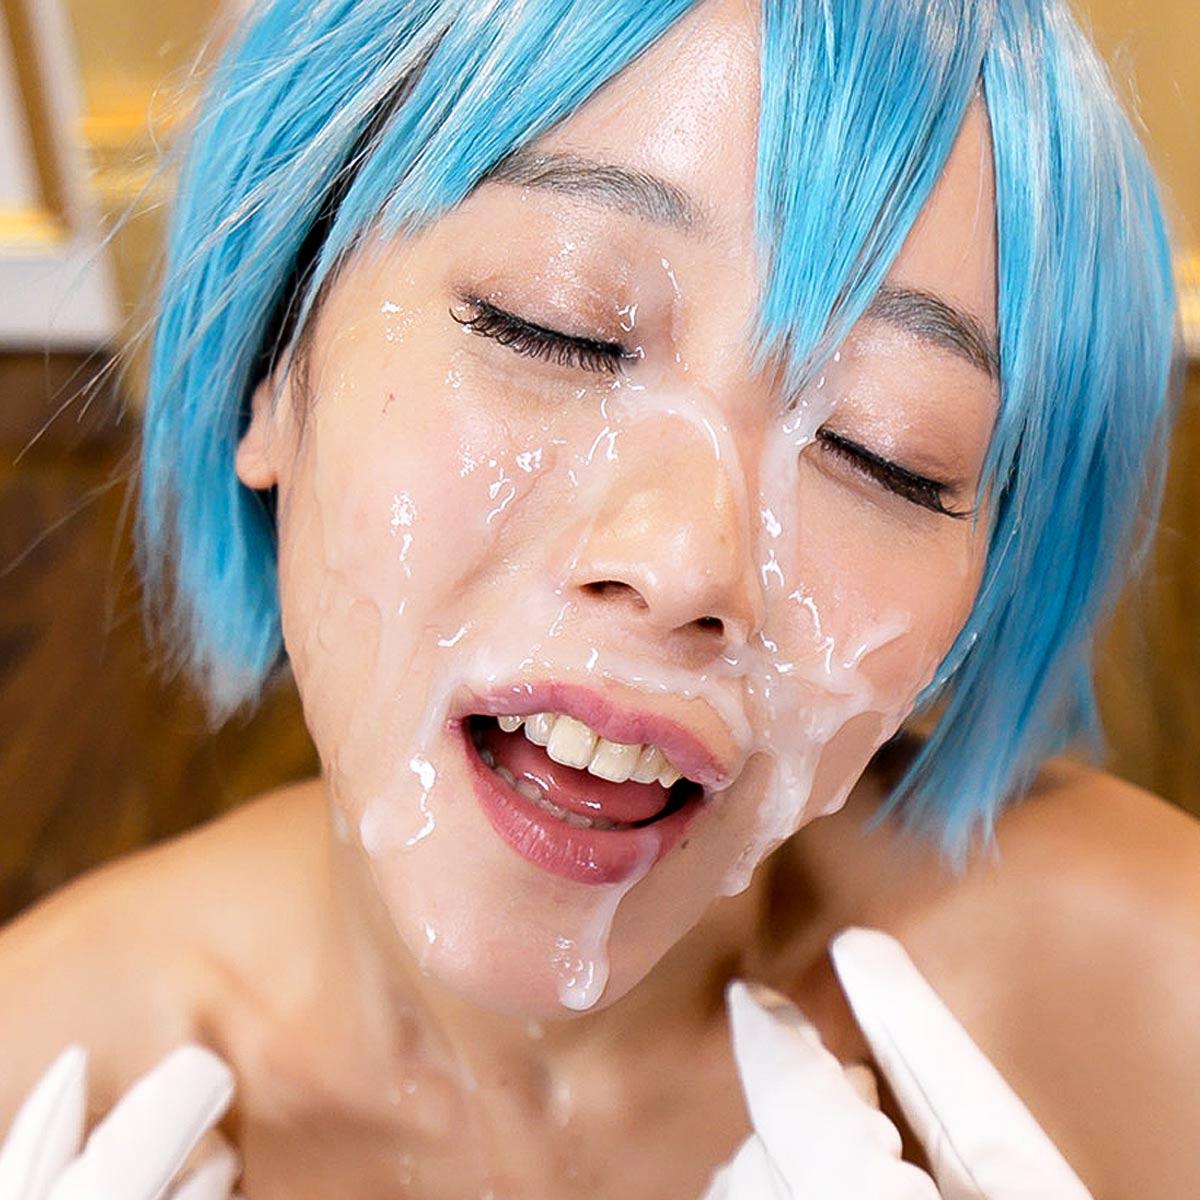 Cospuri. Cosplay porn, nude Harajuku hardcore girls doing Fellatio, Bukkake, Costume Fetish in uncensored sex videos.